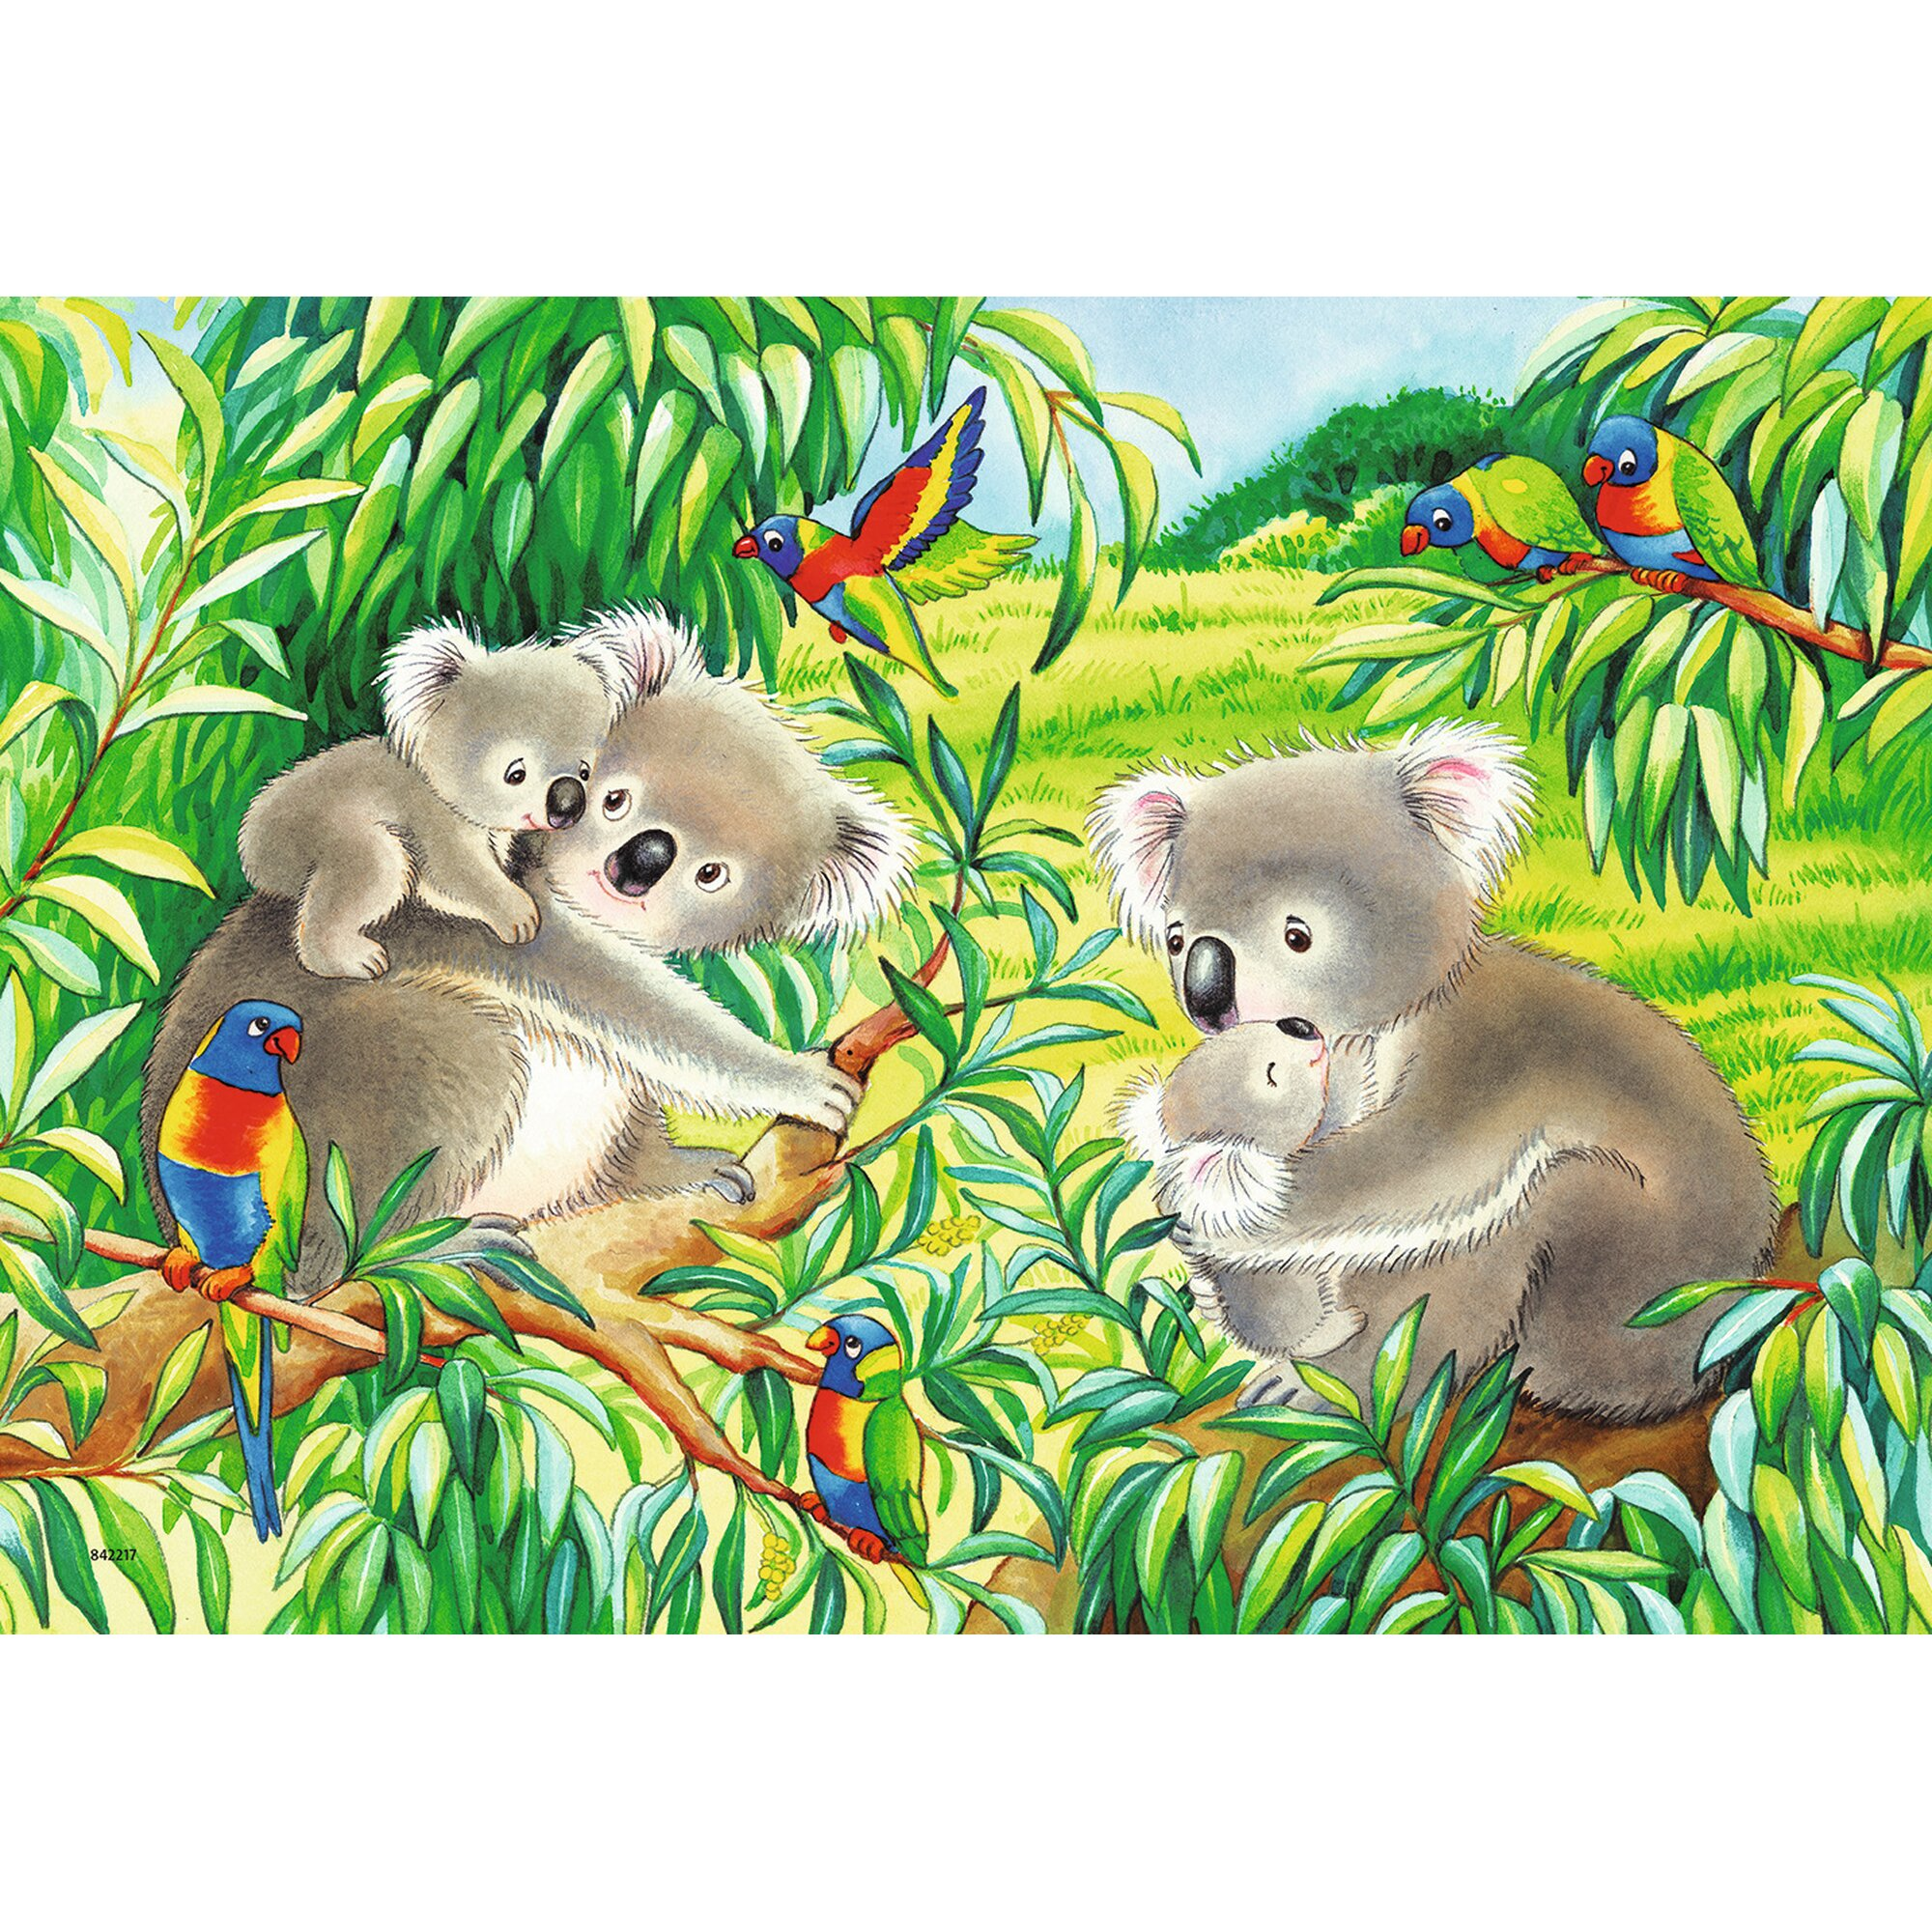 ravensburger-zwei-kinderpuzzles-inkl-mini-postern-24-teile-su-e-koalas-und-pandas